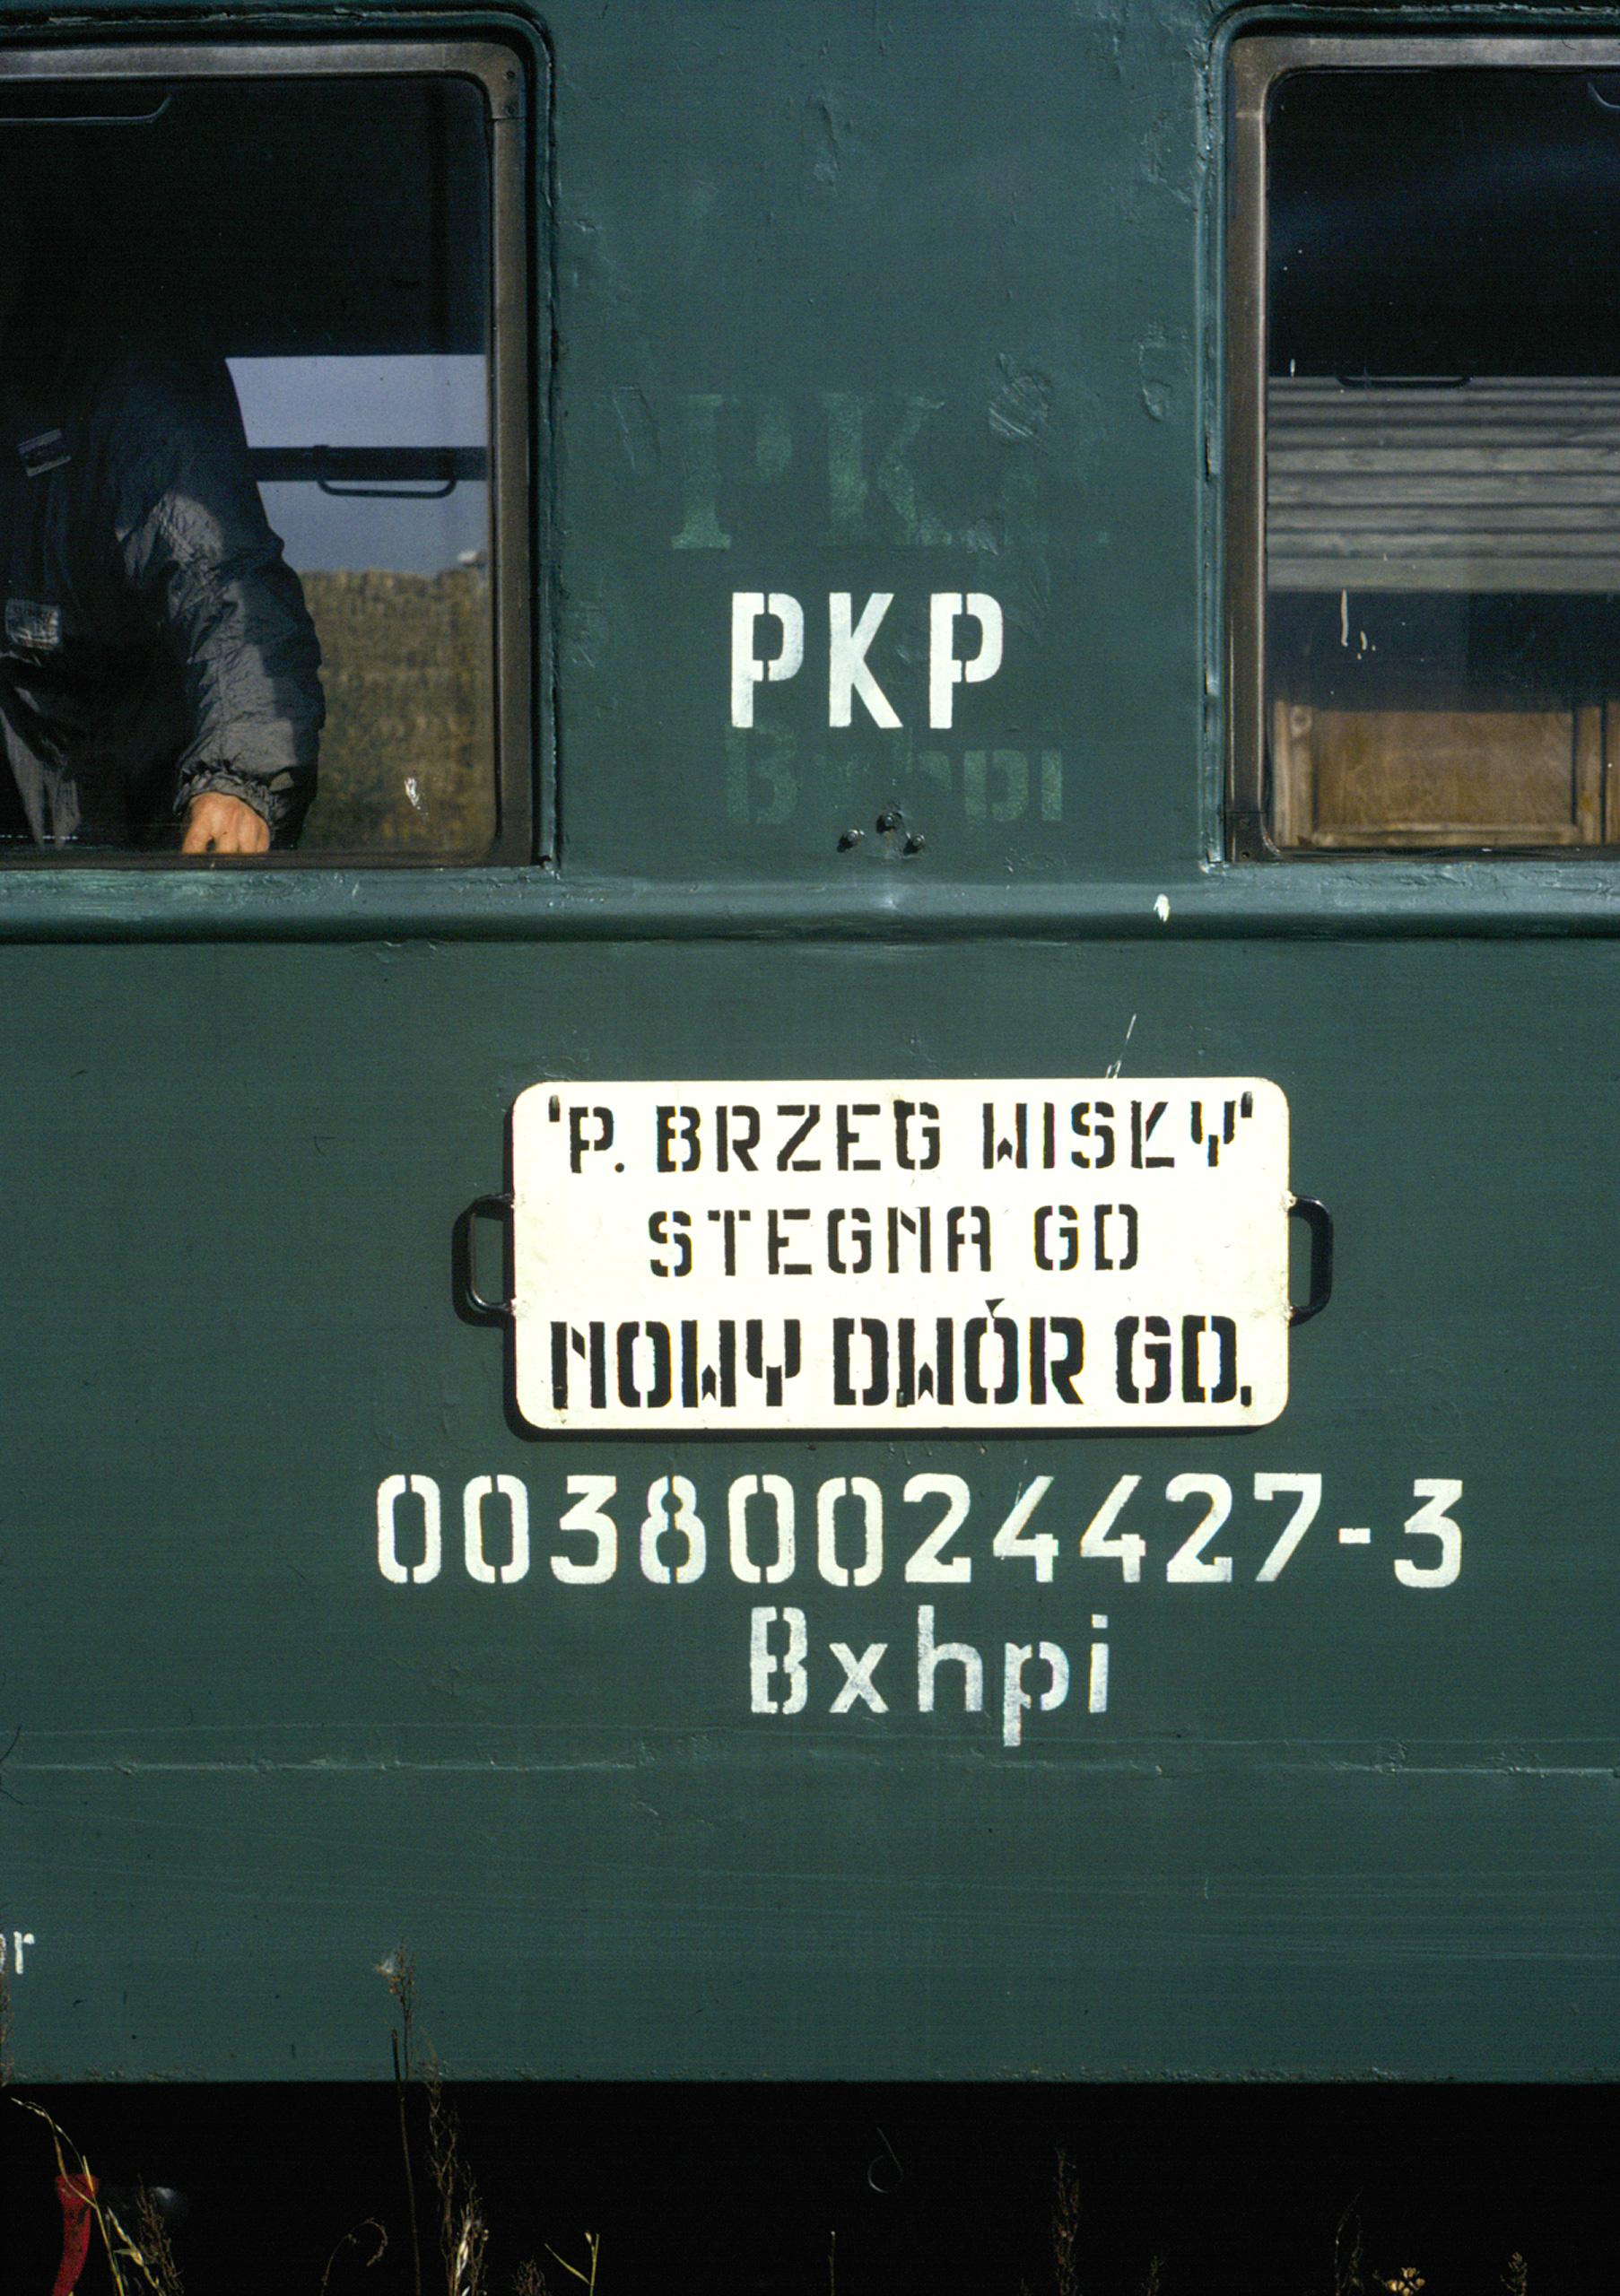 PKP narrow gauge coach